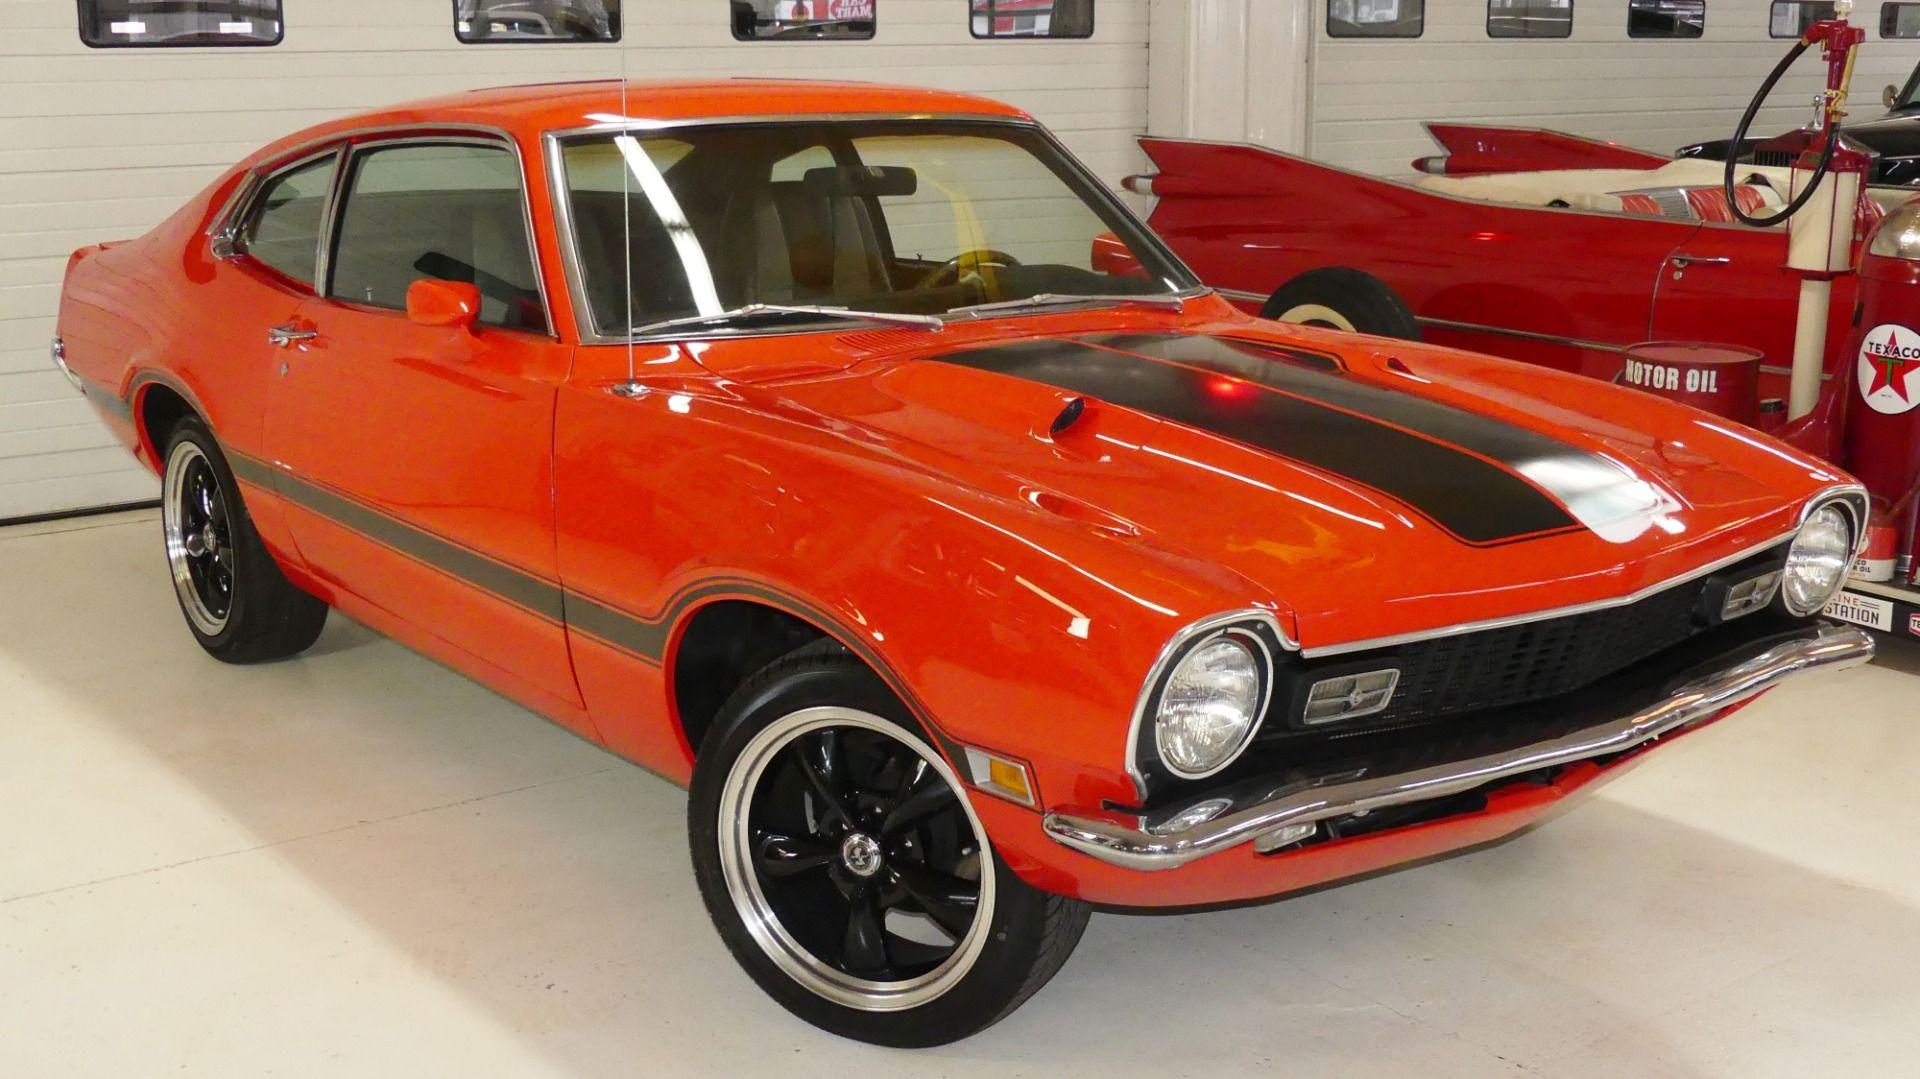 1971 ford maverick stock 235134 for sale near columbus